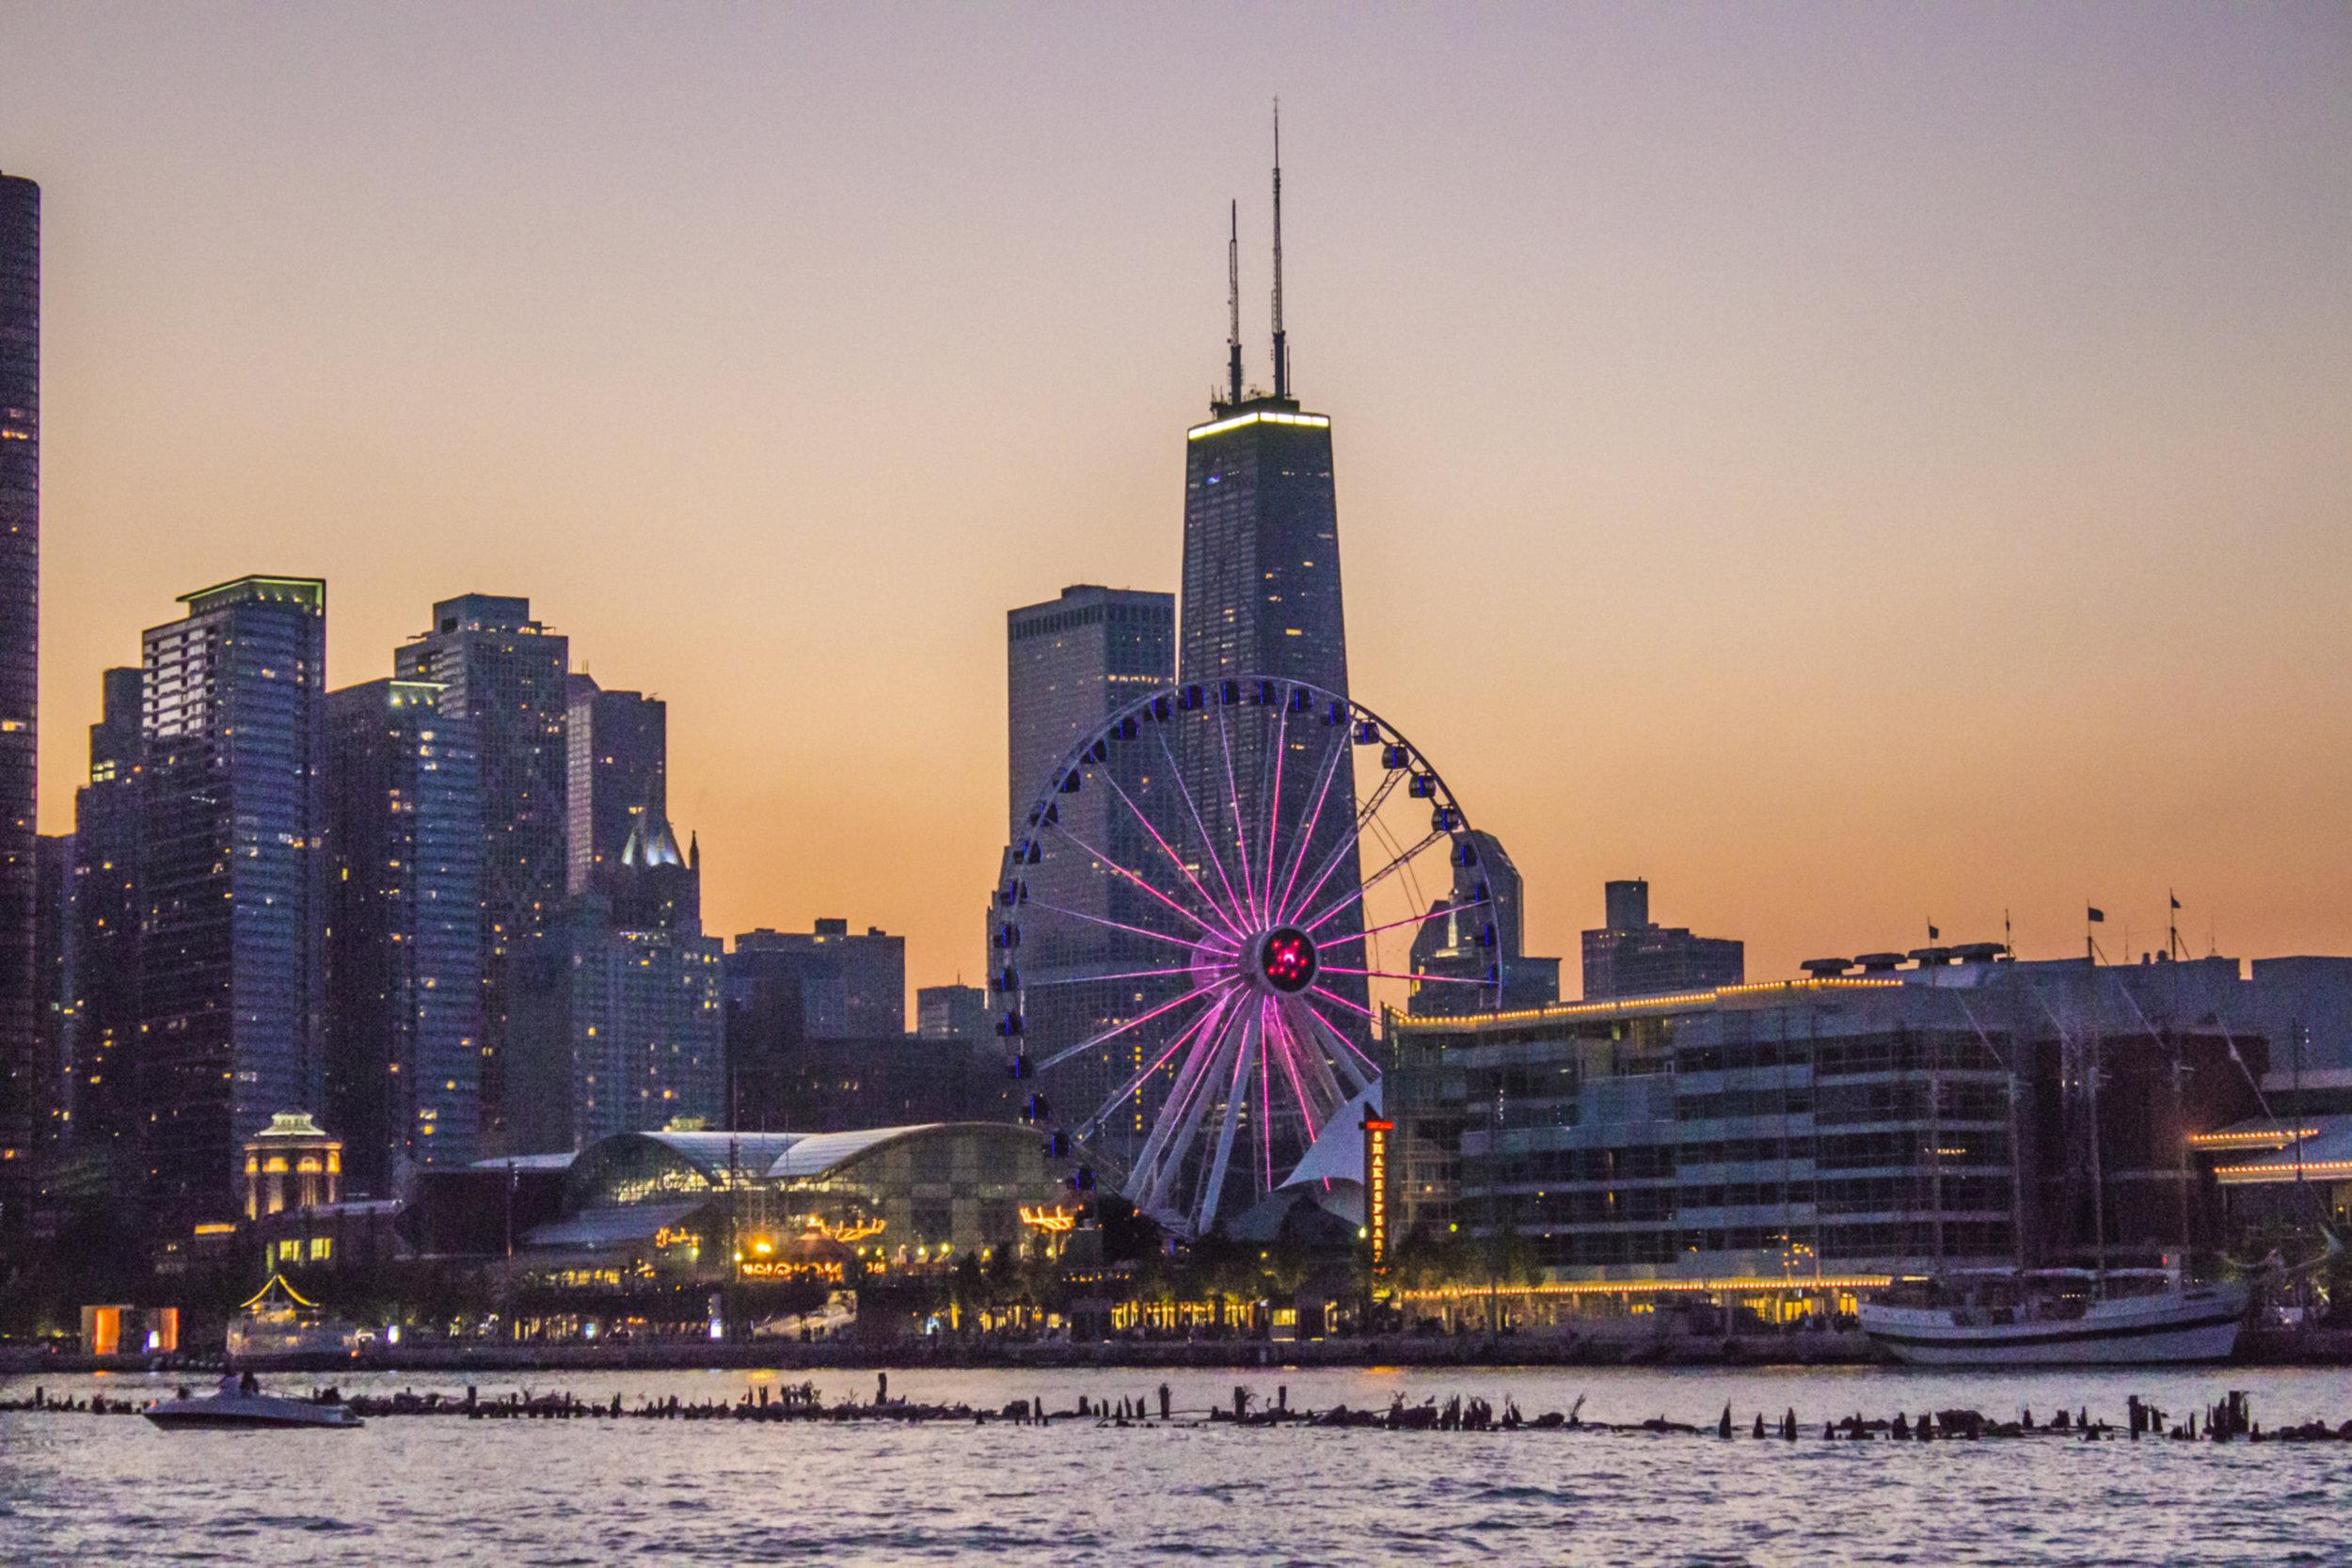 Navy Pier & Centennial Wheel